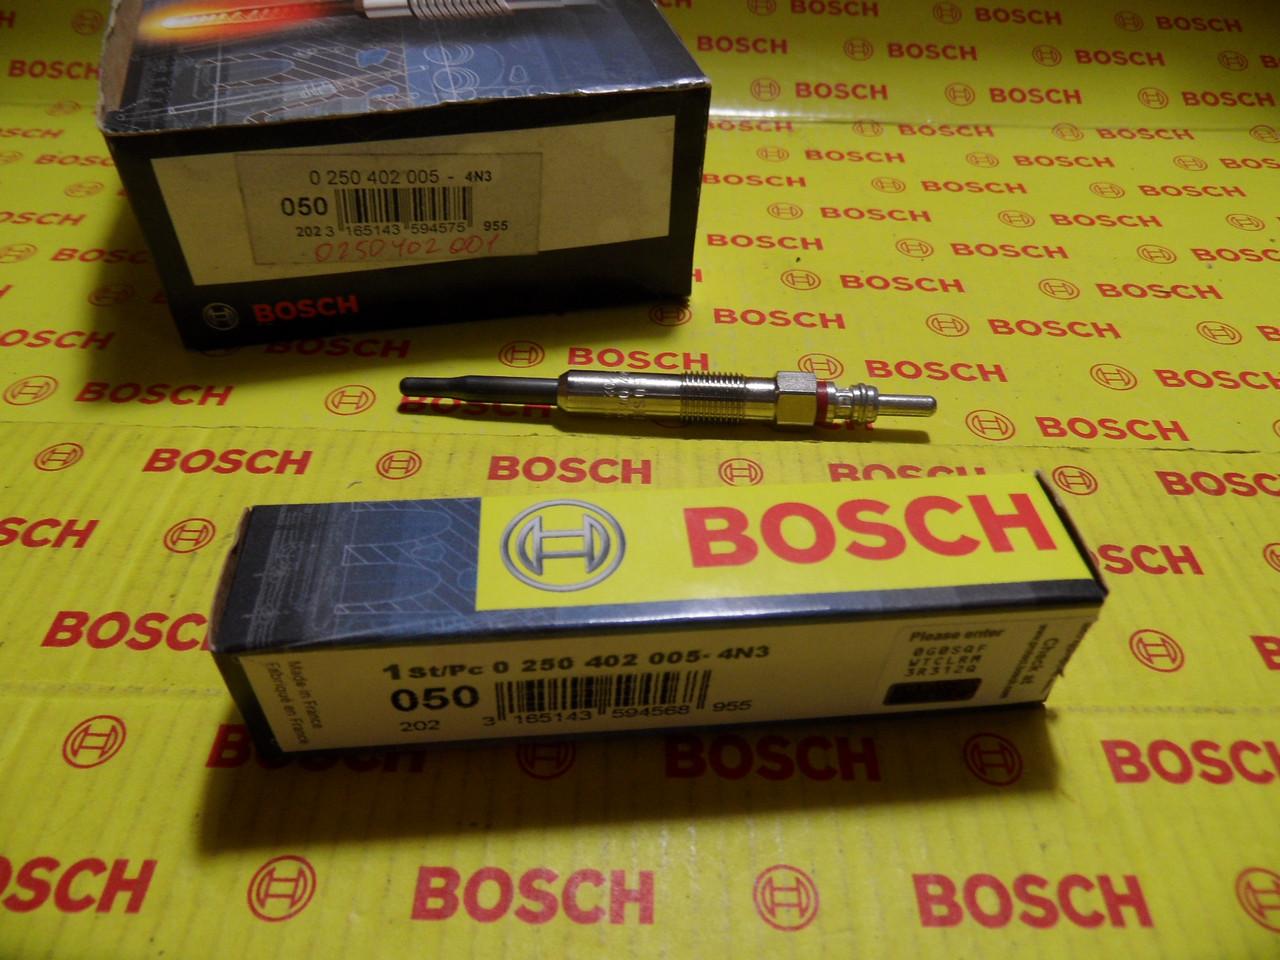 Свечи накаливания Bosch, 0250402005, 0 250 402 005